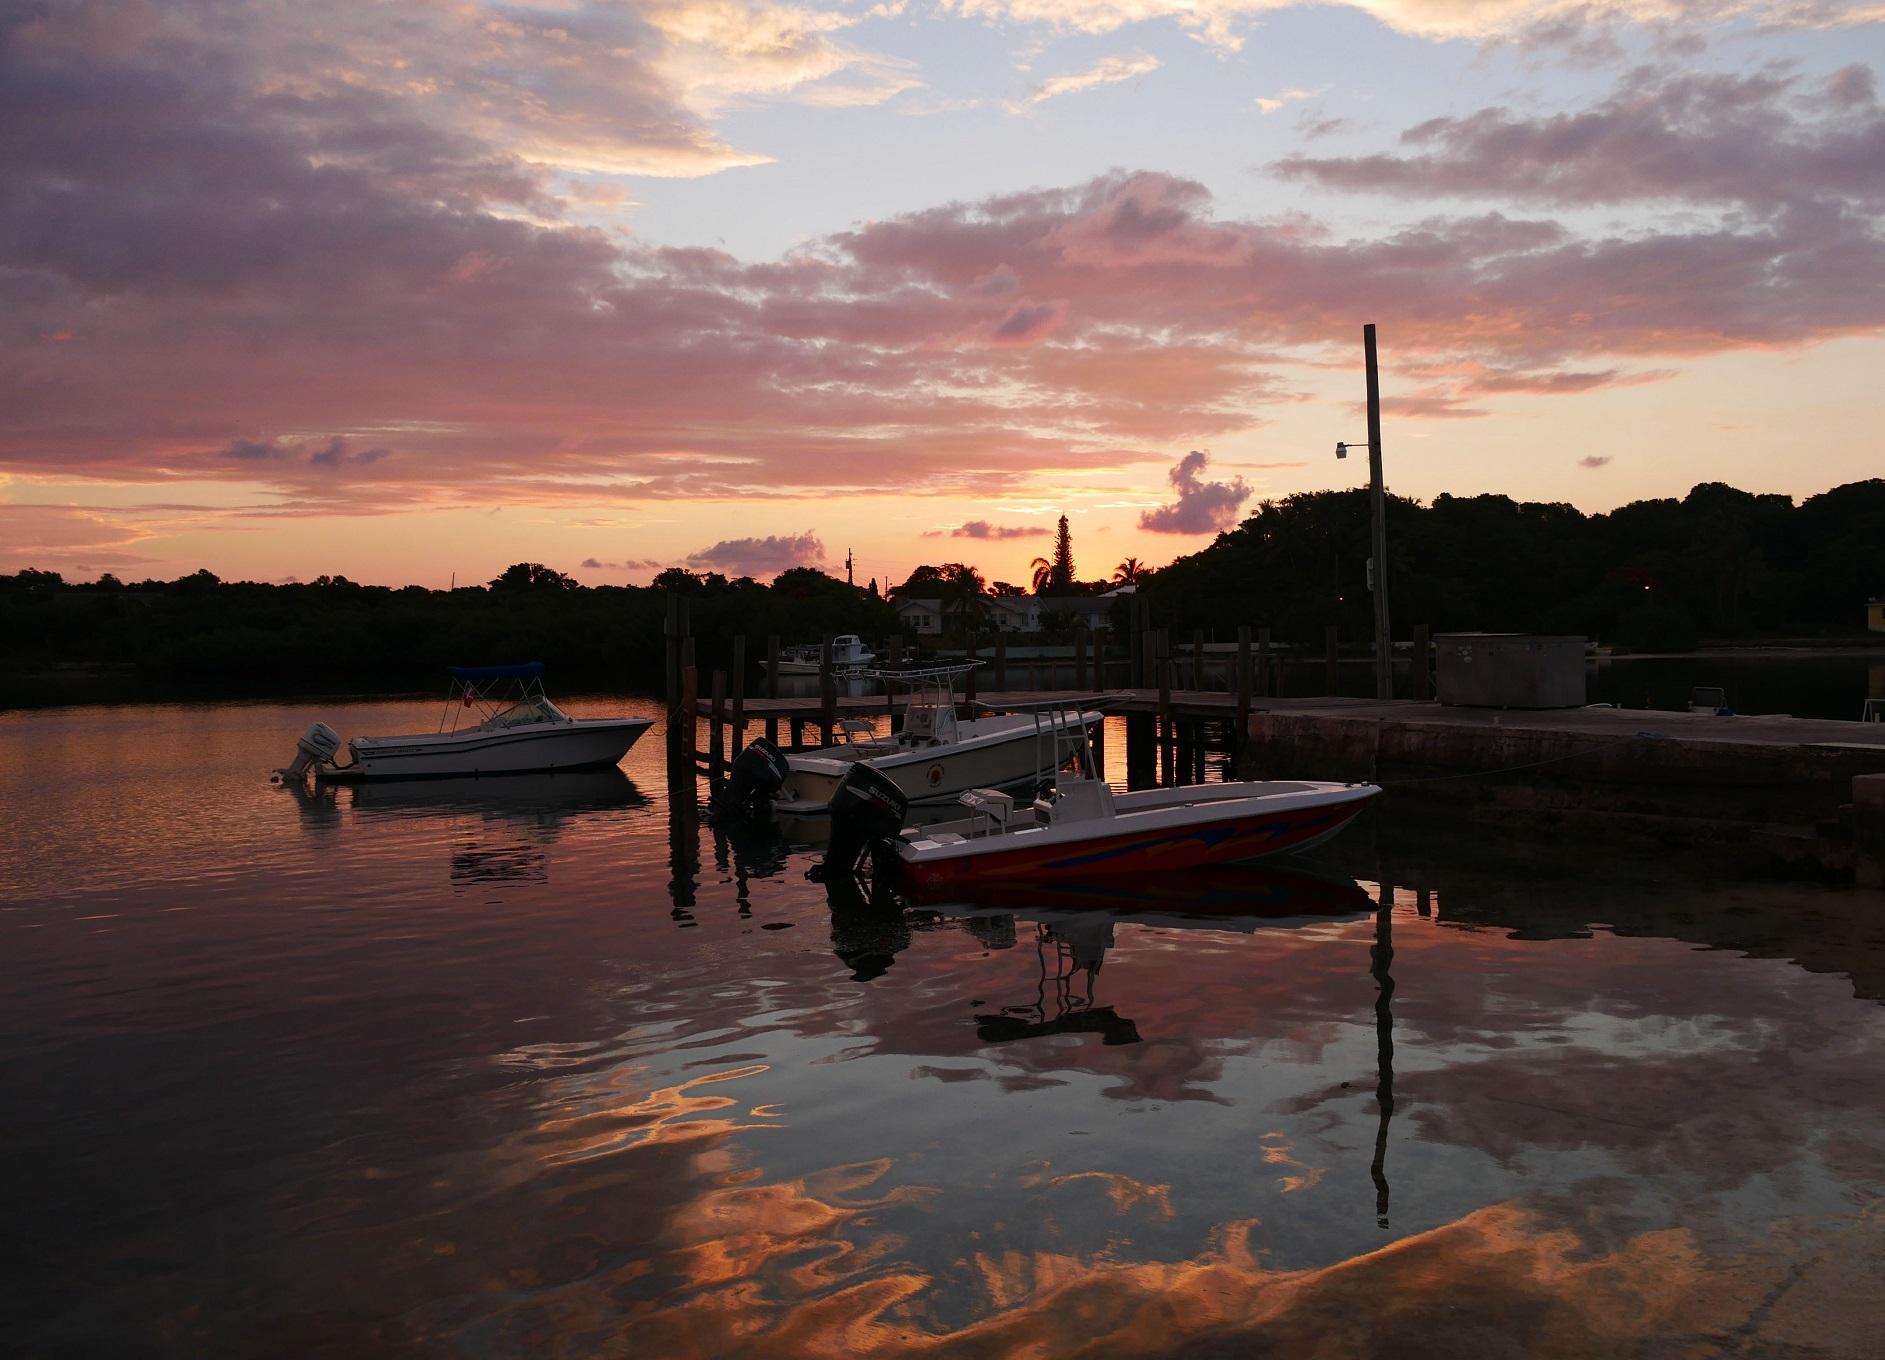 Sunrise over Settlement Creek, Green Turtle Cay, Bahamas